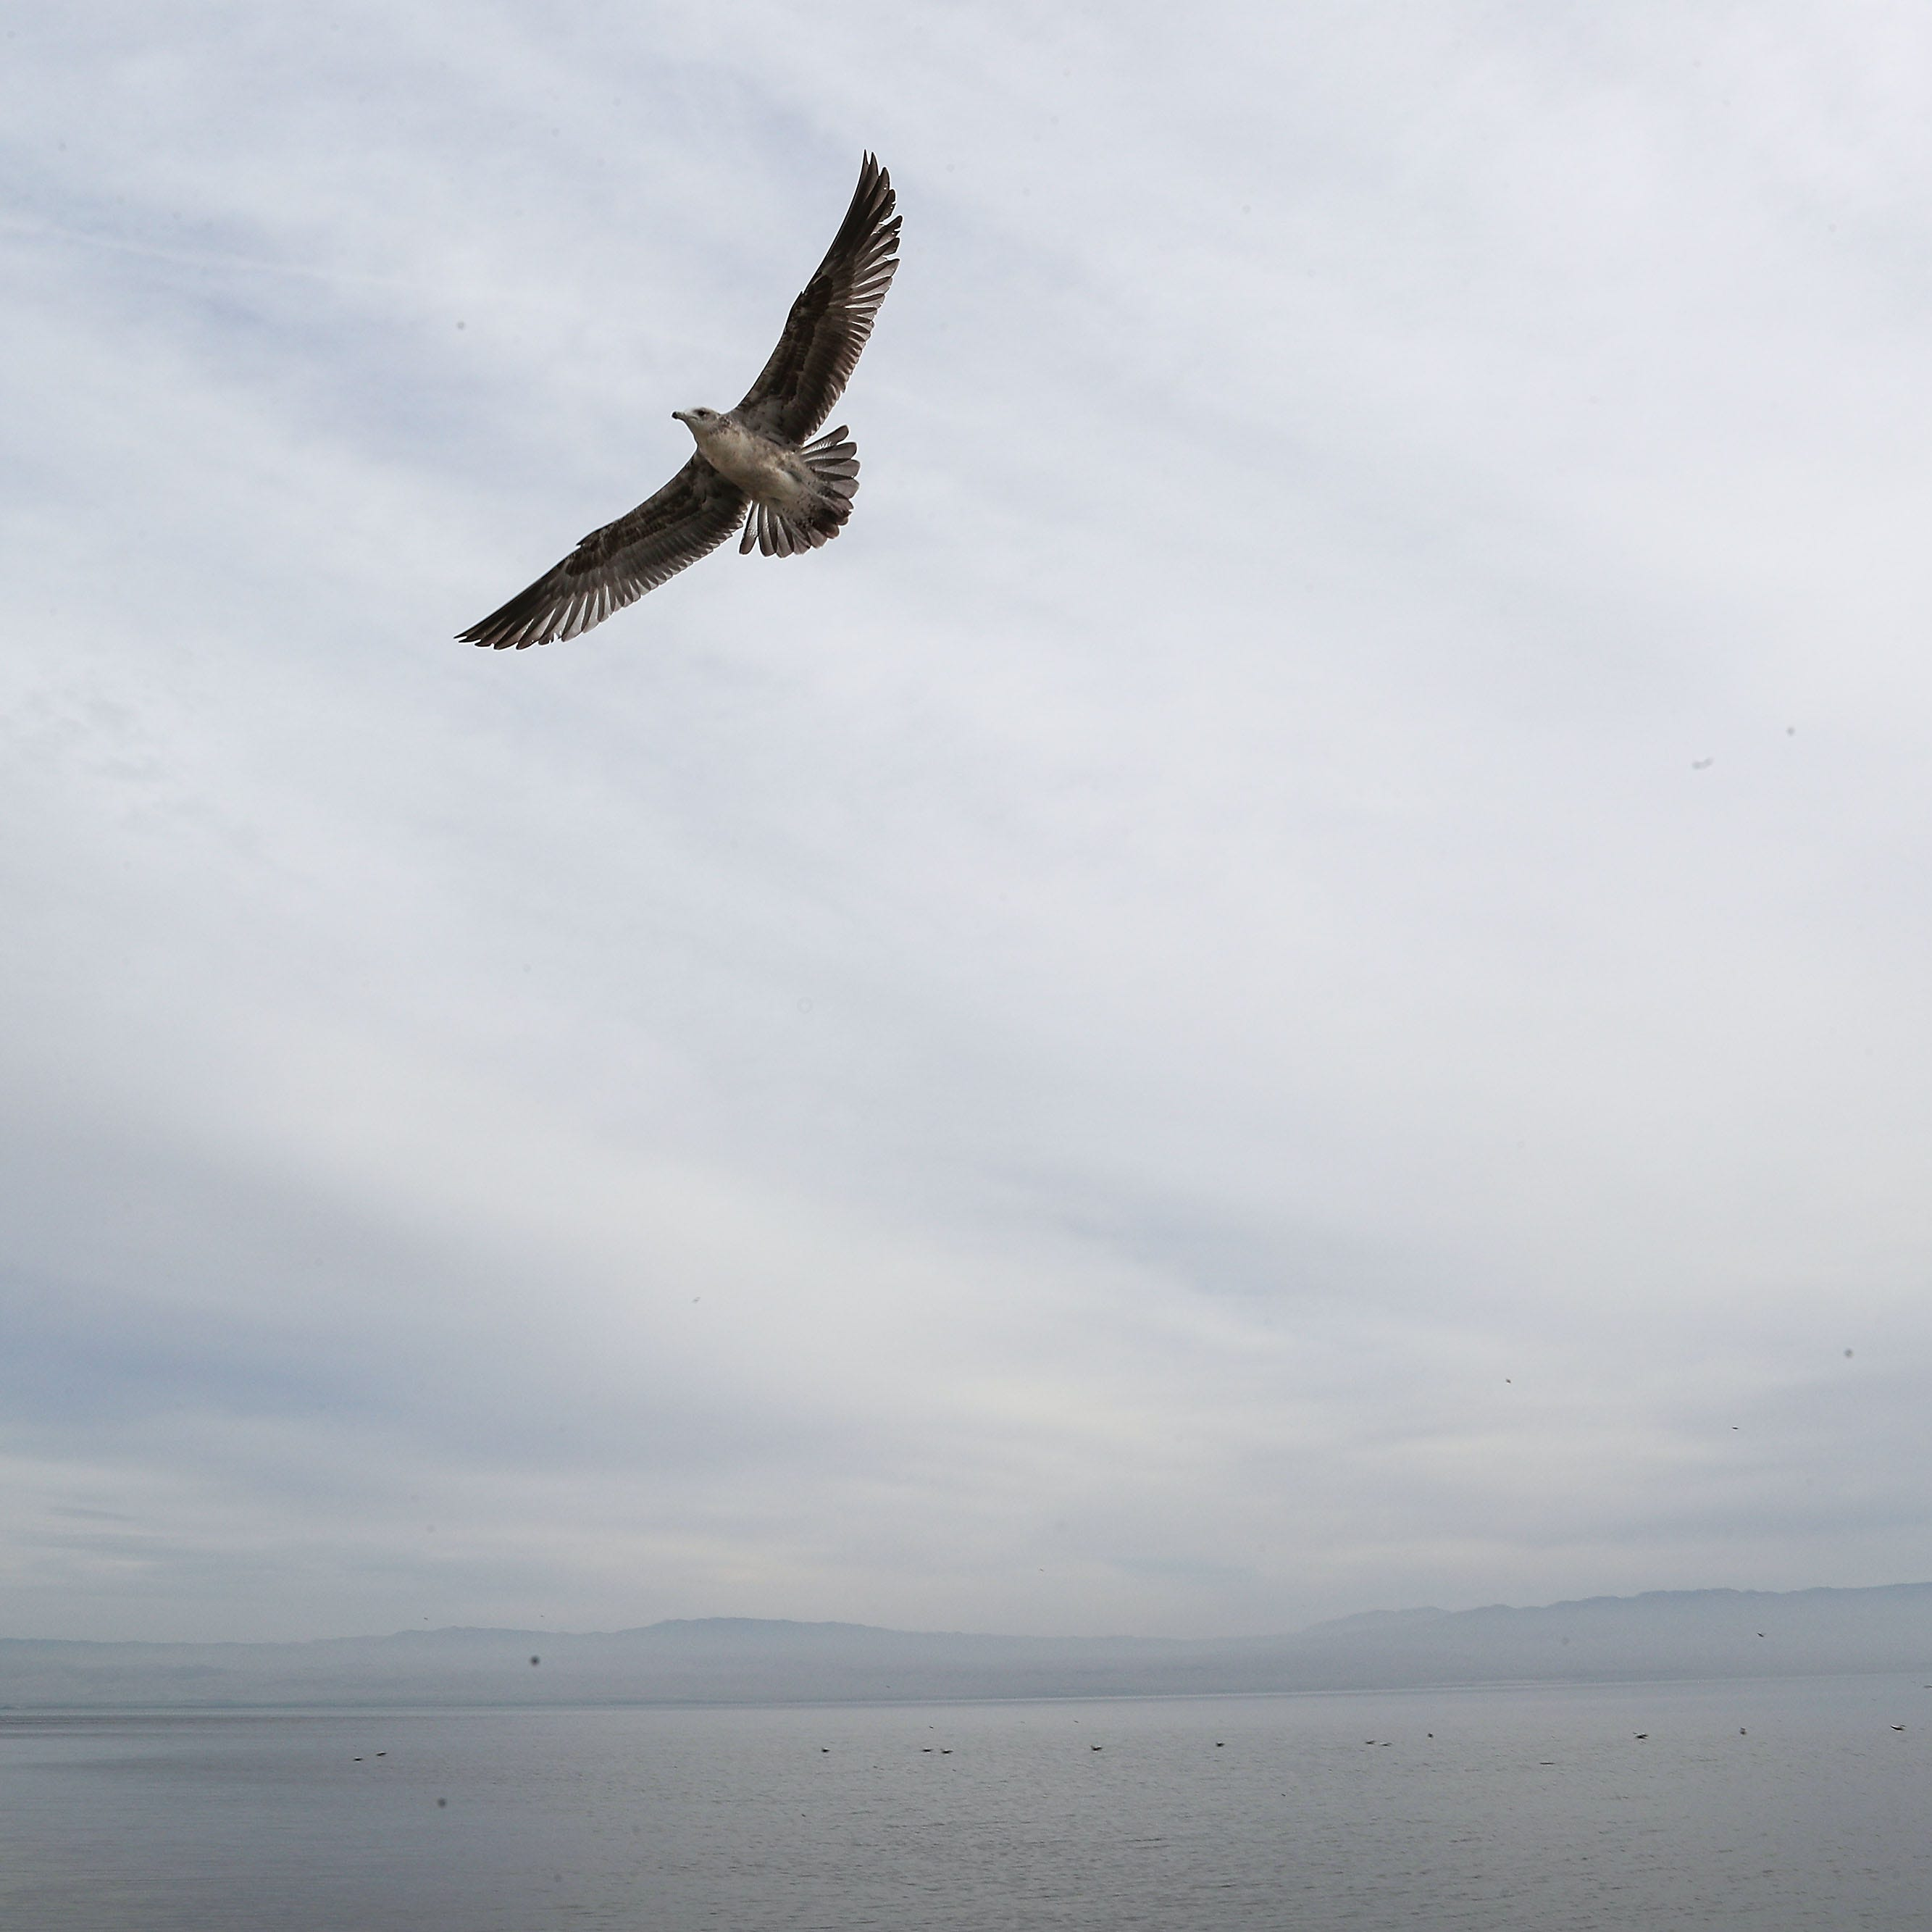 Sunny days, fertilizer runoff and sewage can create toxic bacteria at Salton Sea